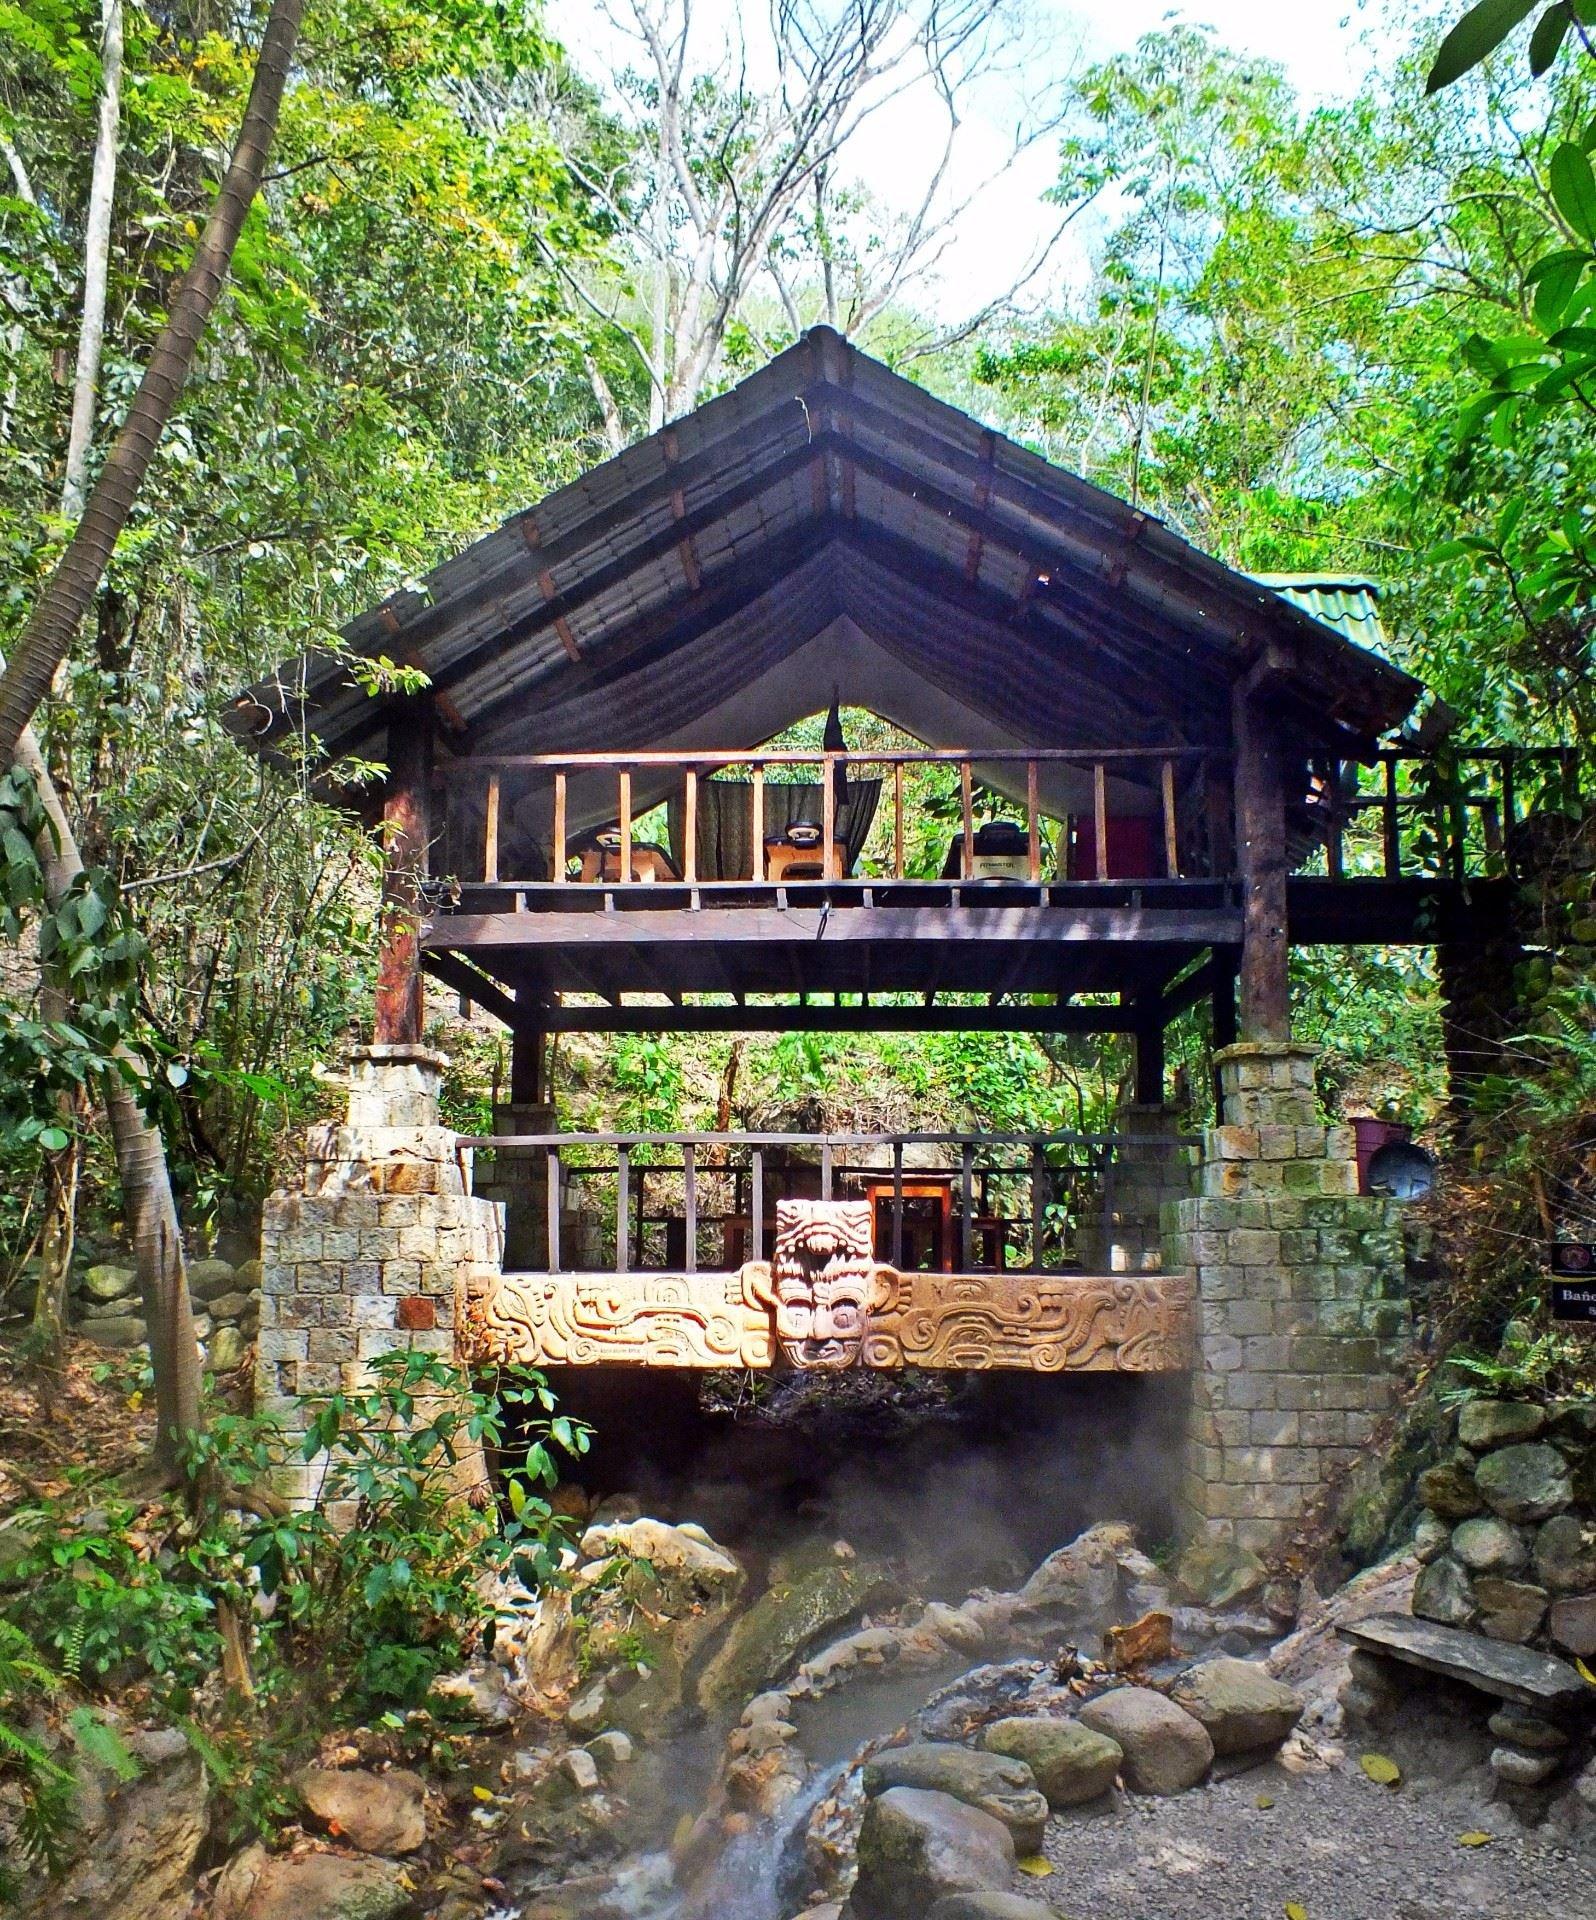 Luna Jaguar Natural Hot Springs & Spa in Copán